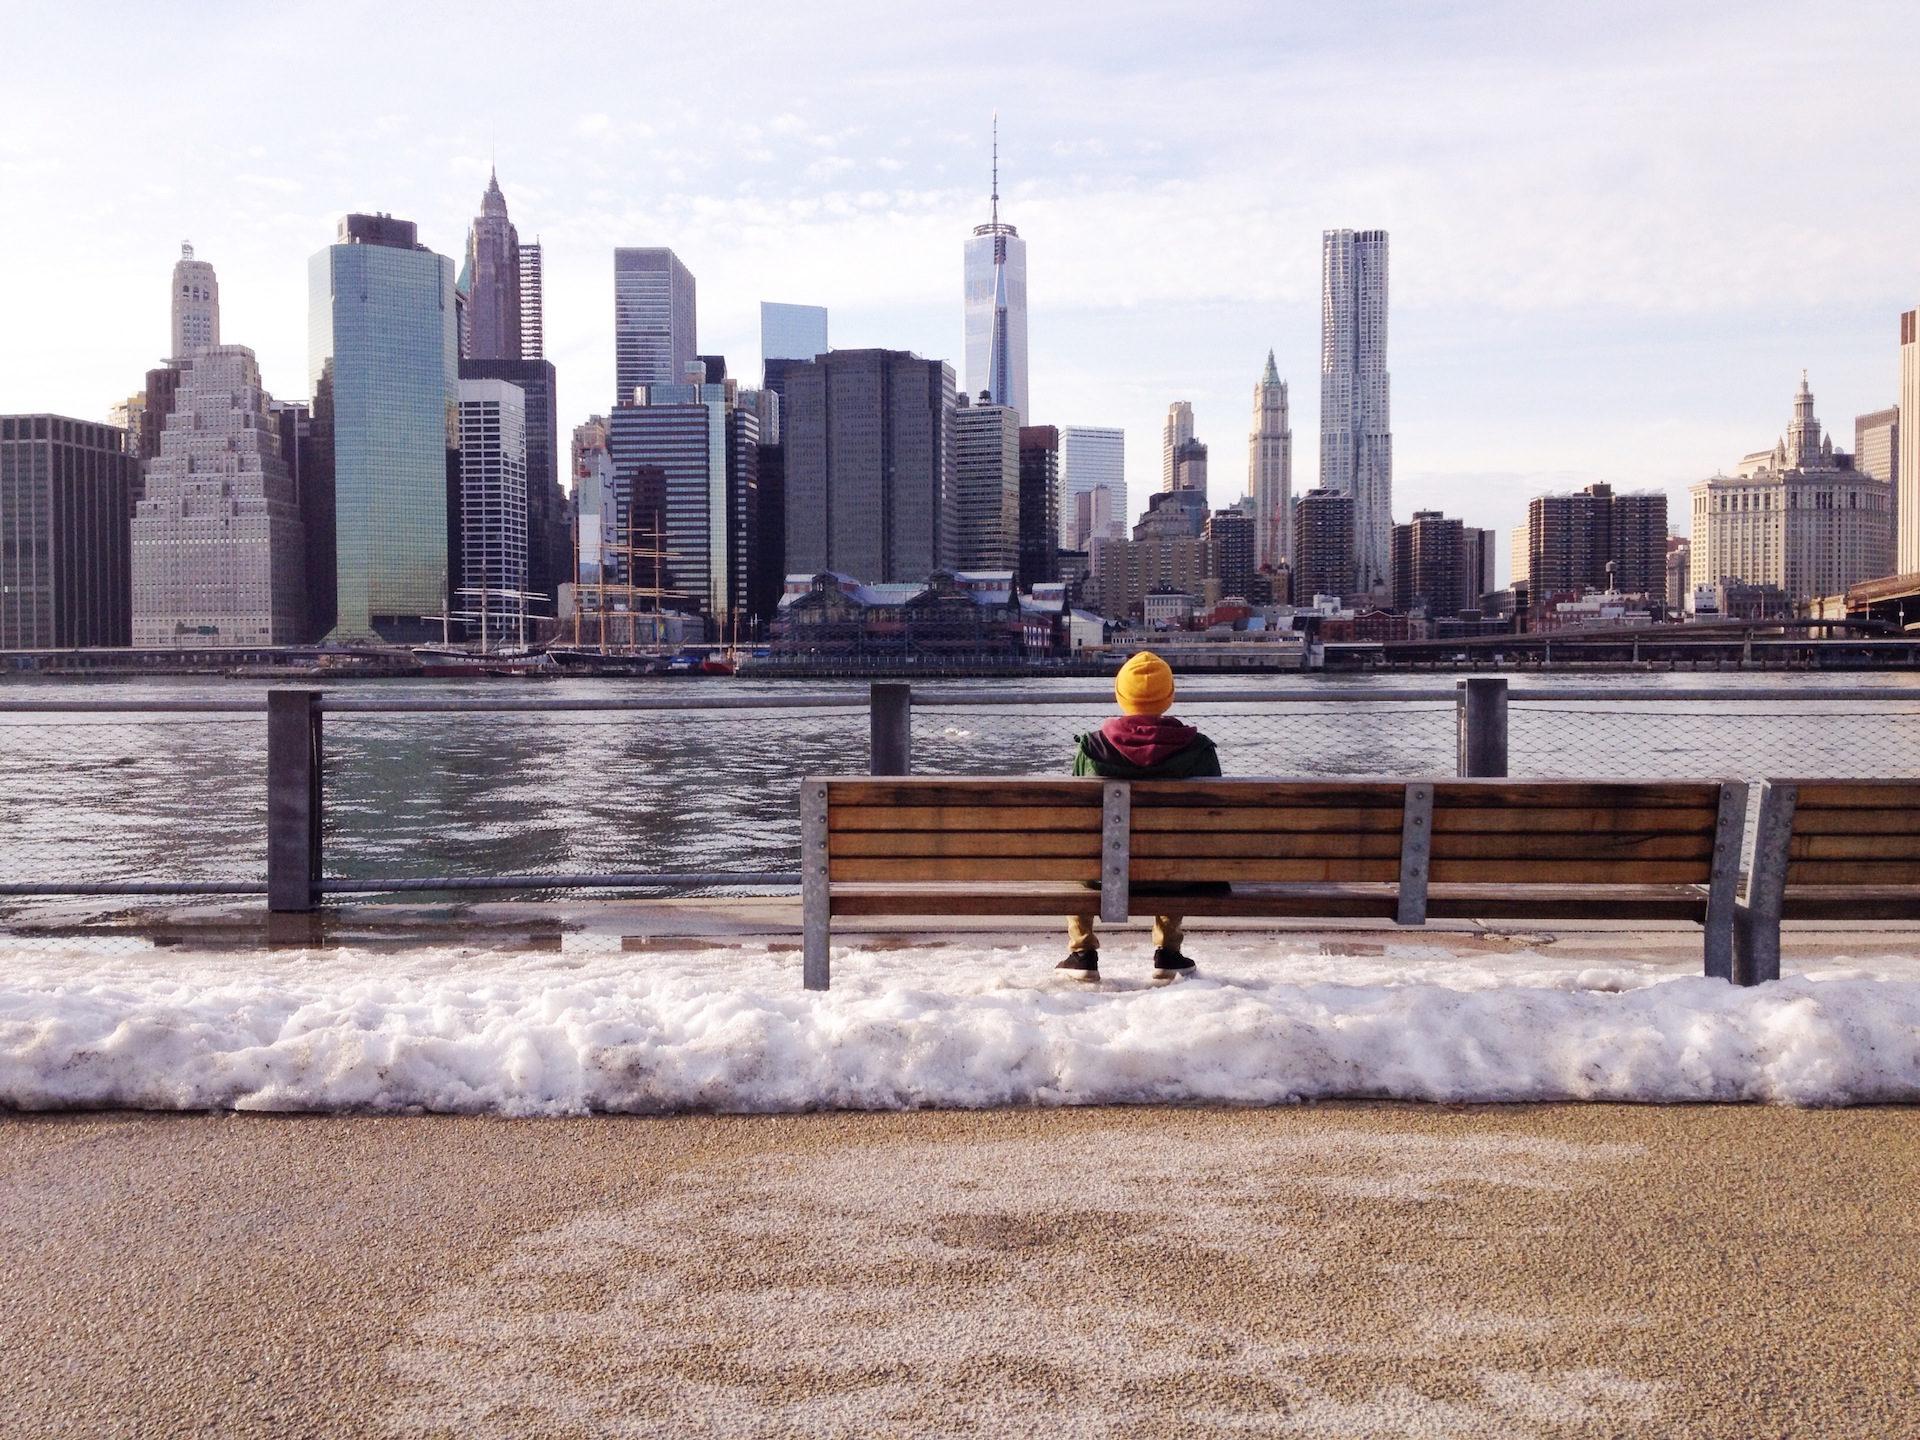 Città, sedile, Banca, uomo, Skyline - Sfondi HD - Professor-falken.com